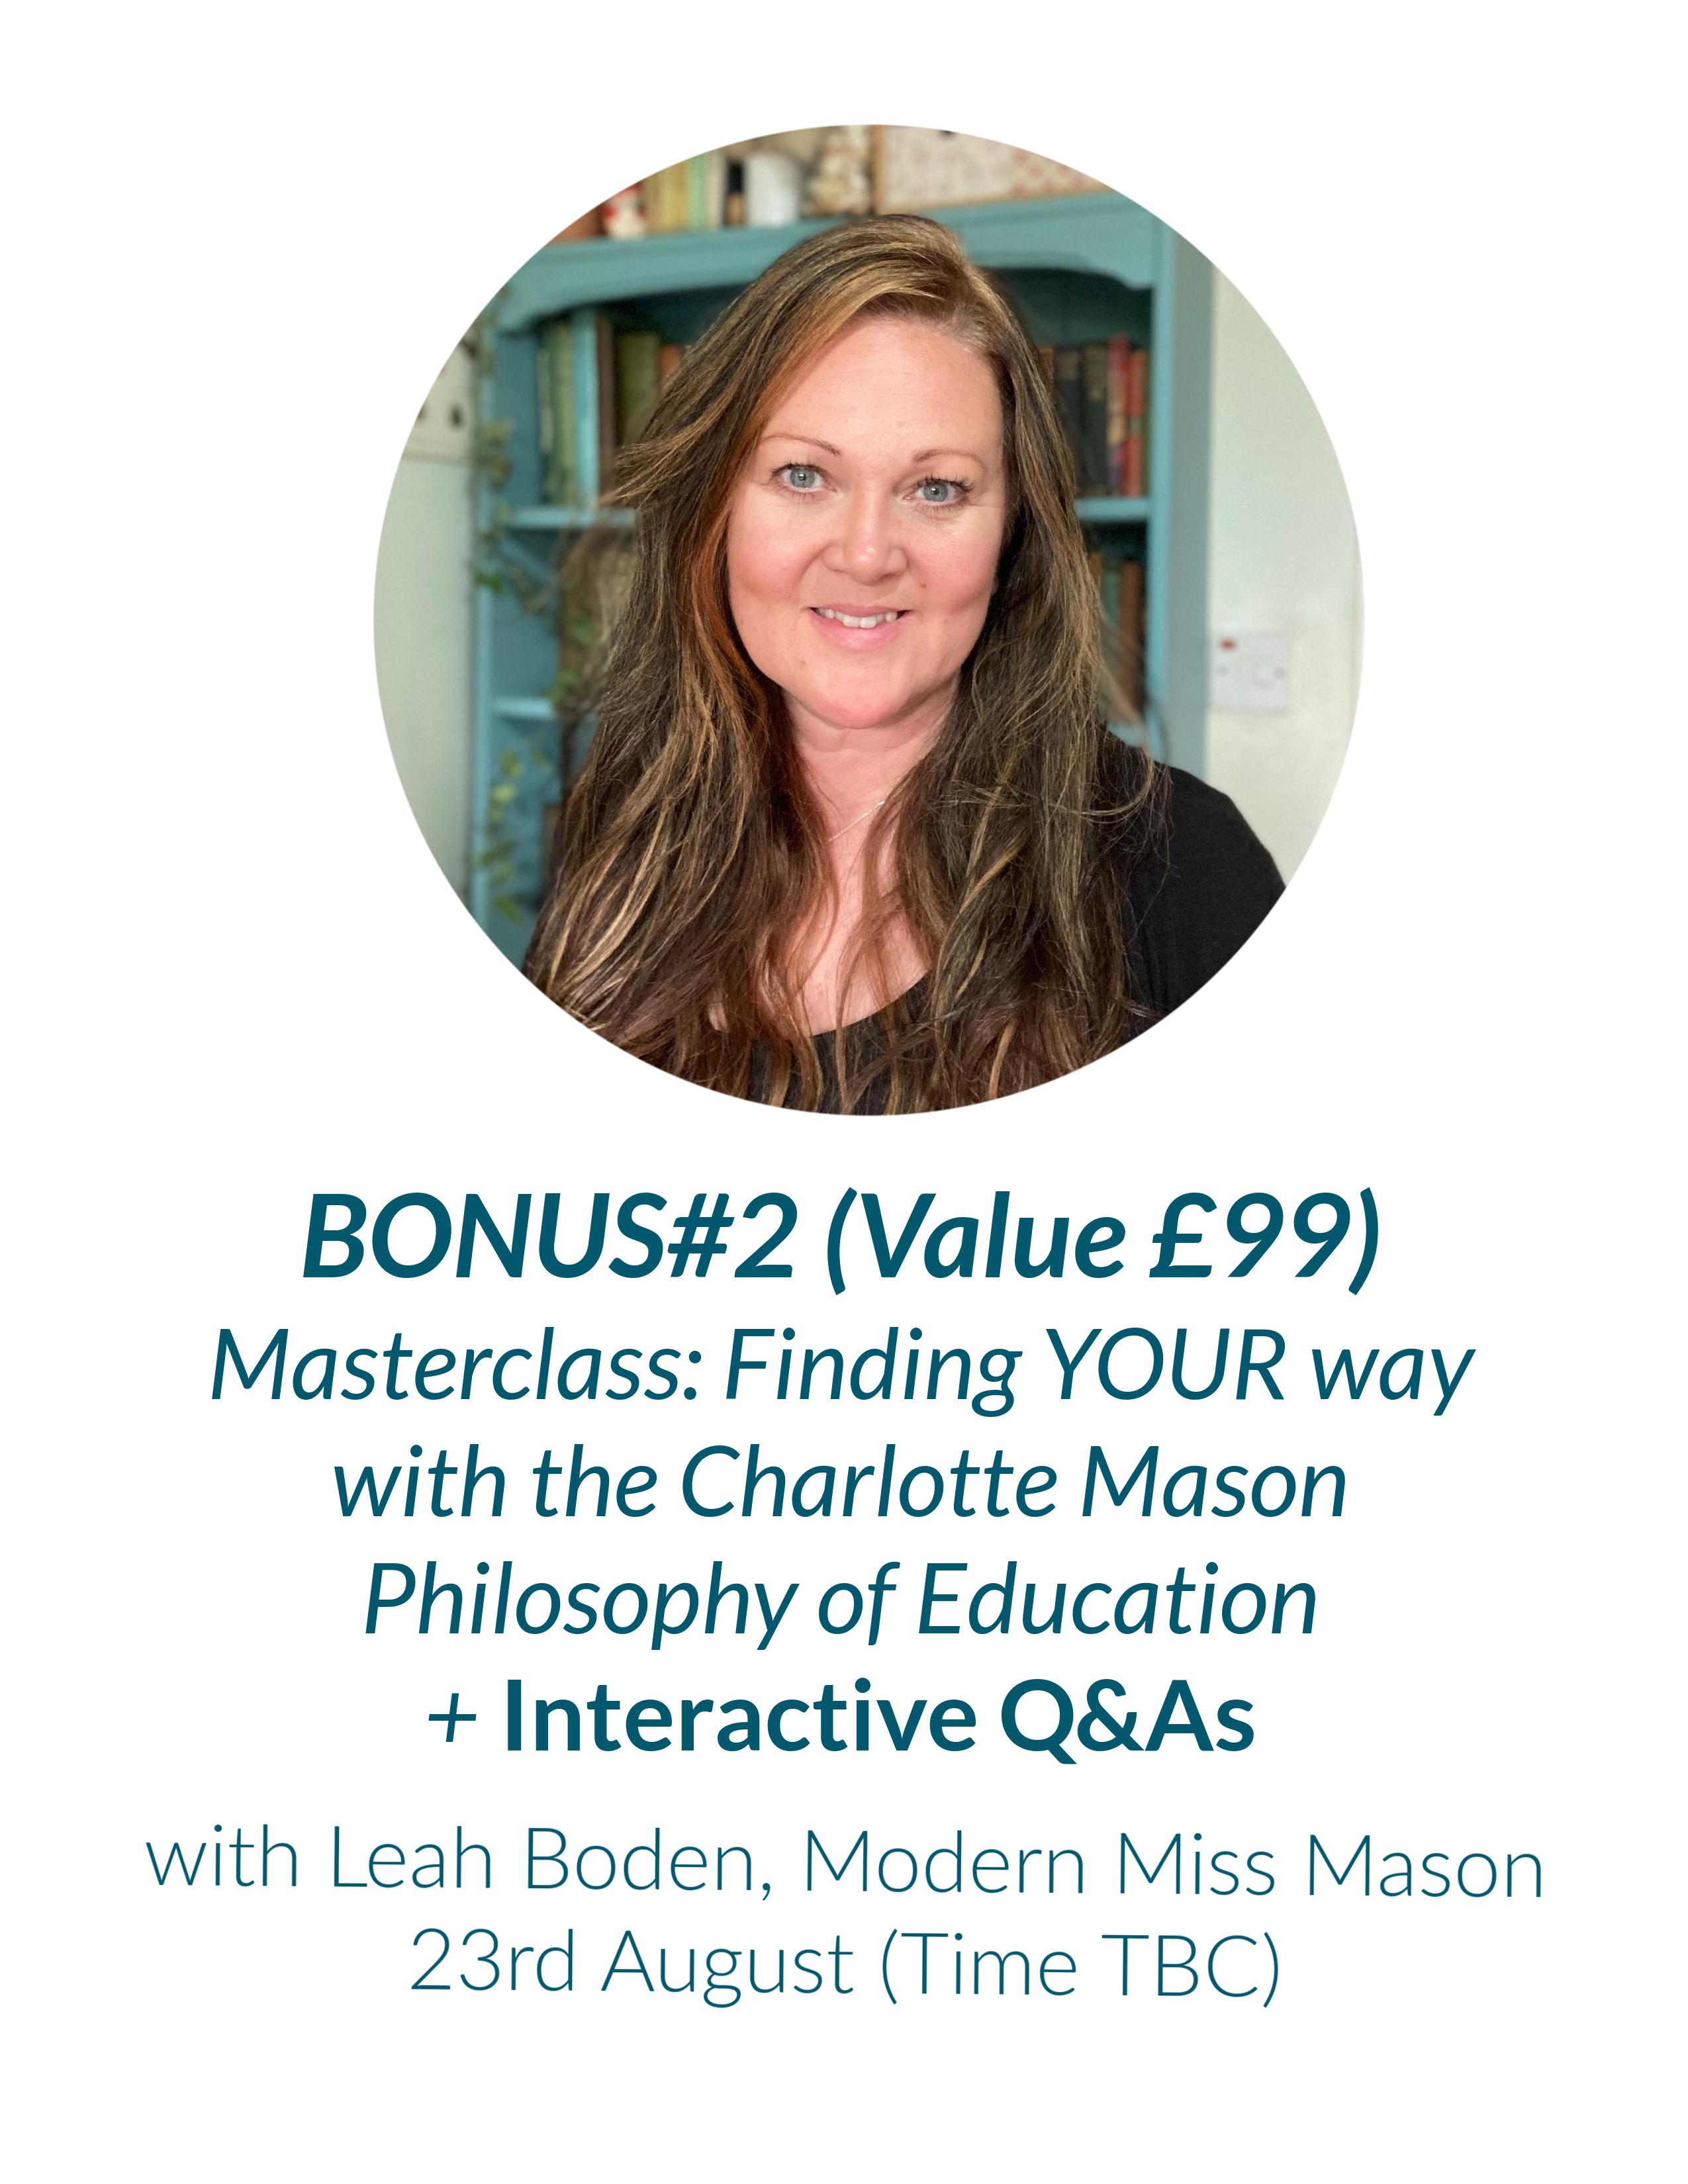 Bonus masterclass with Leah Boden